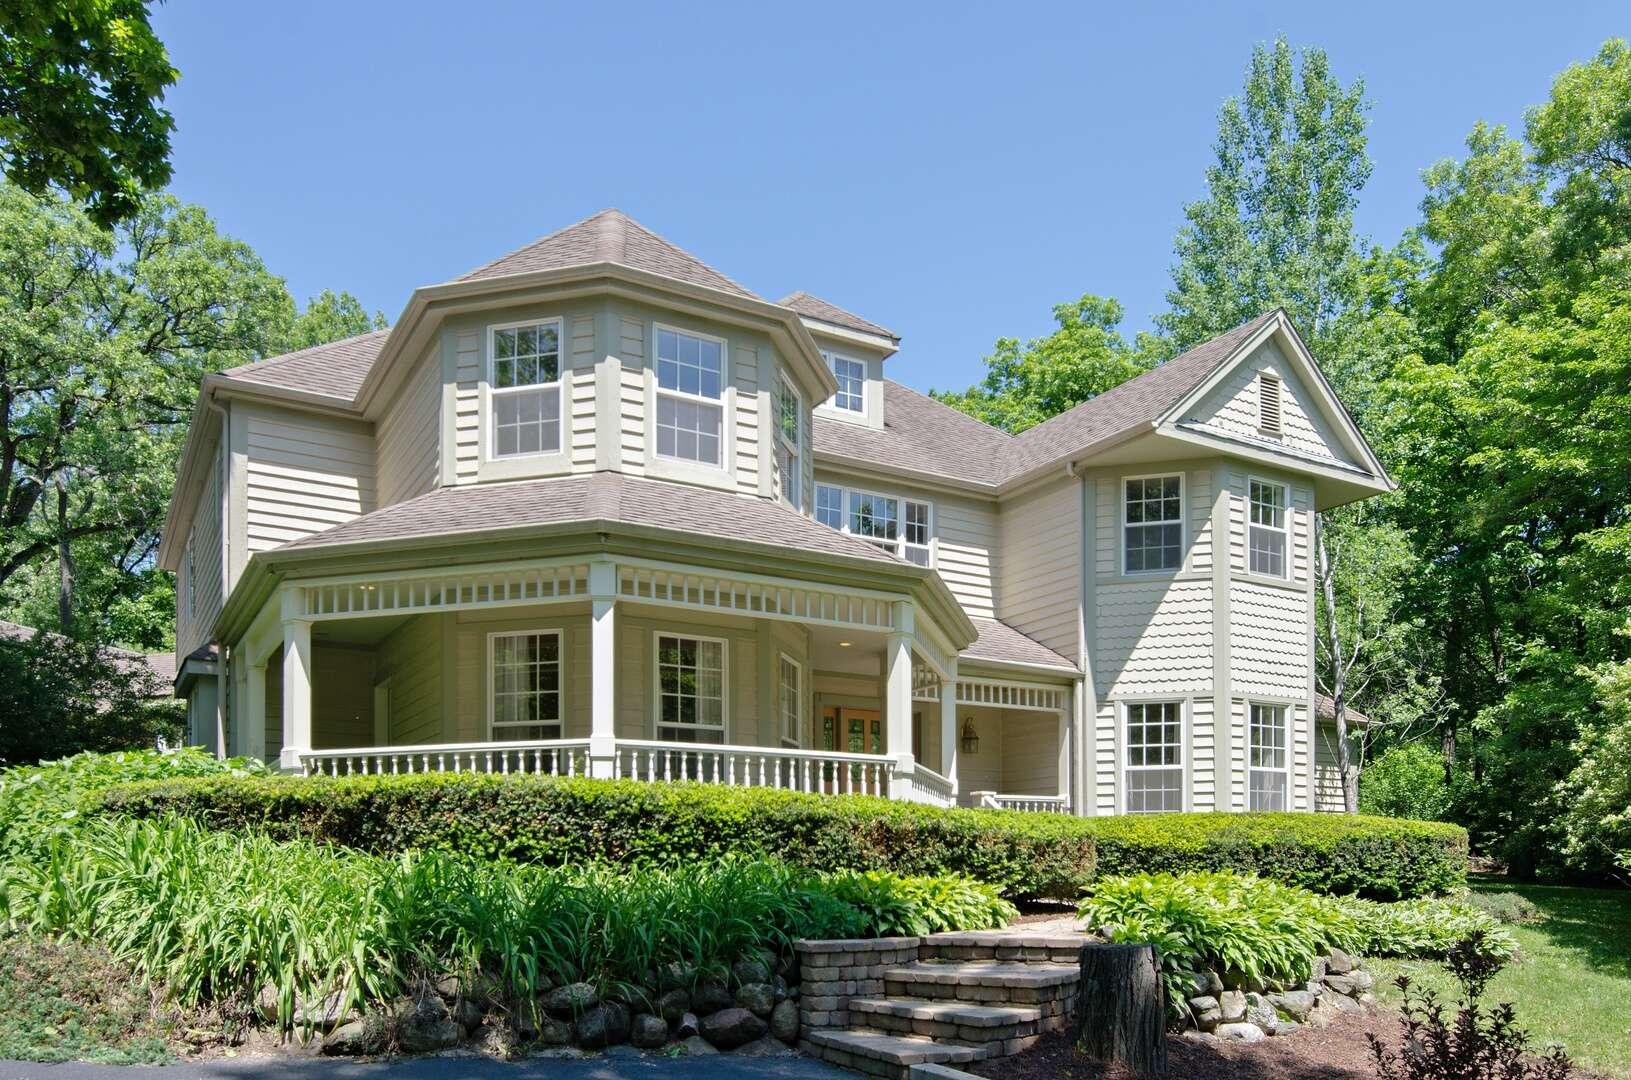 Single Family for Sale at 9804 Autumn Lane Woodstock, Illinois 60098 United States